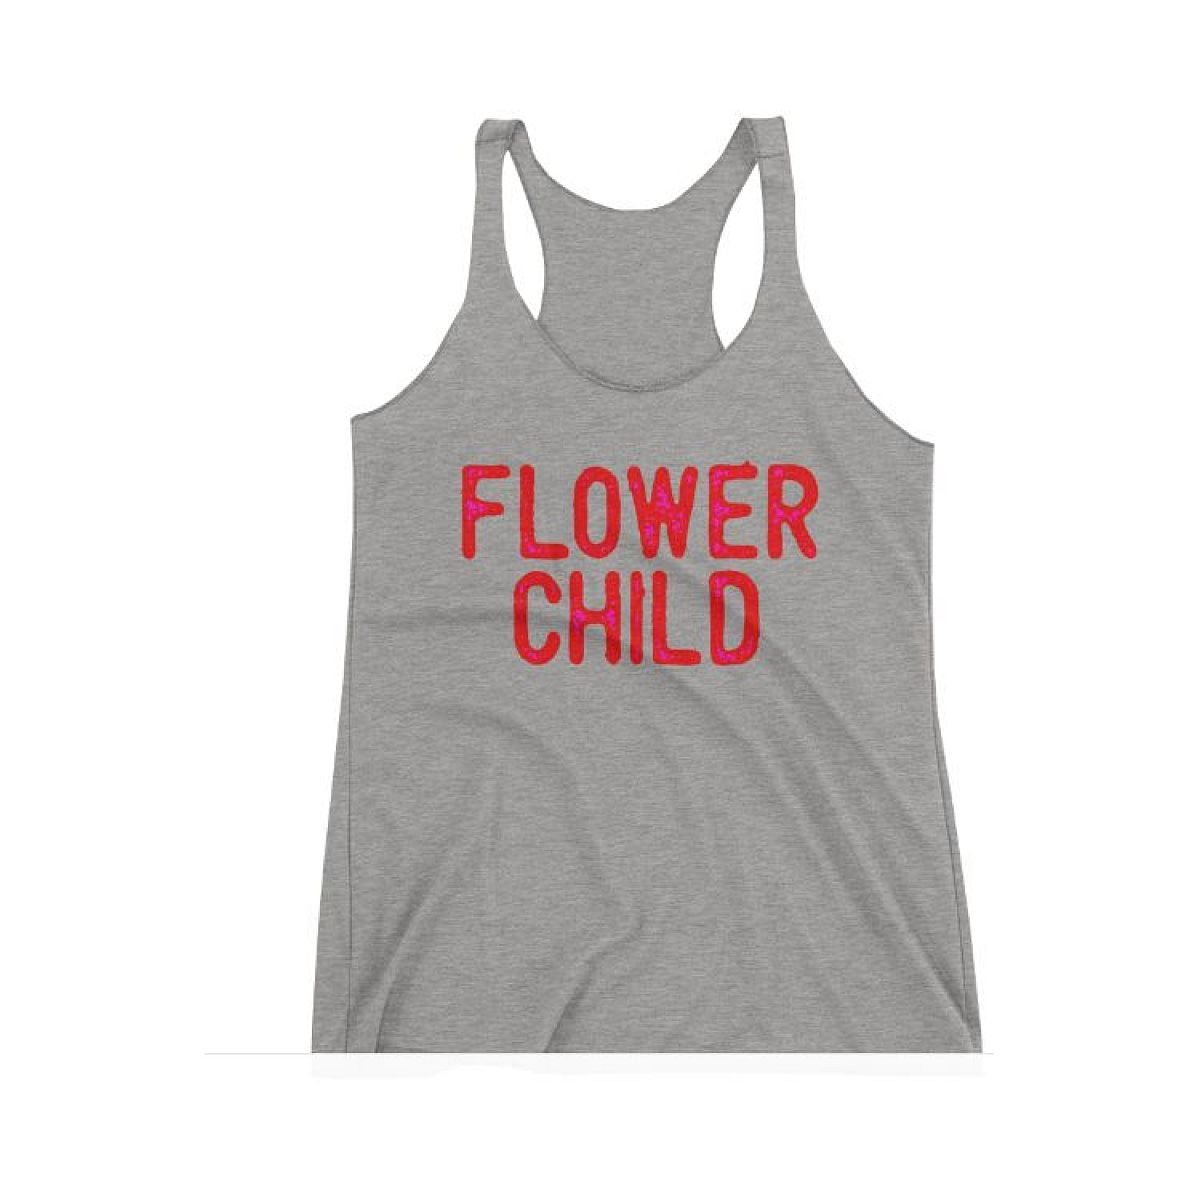 Flowerchild Heather Racer Tank